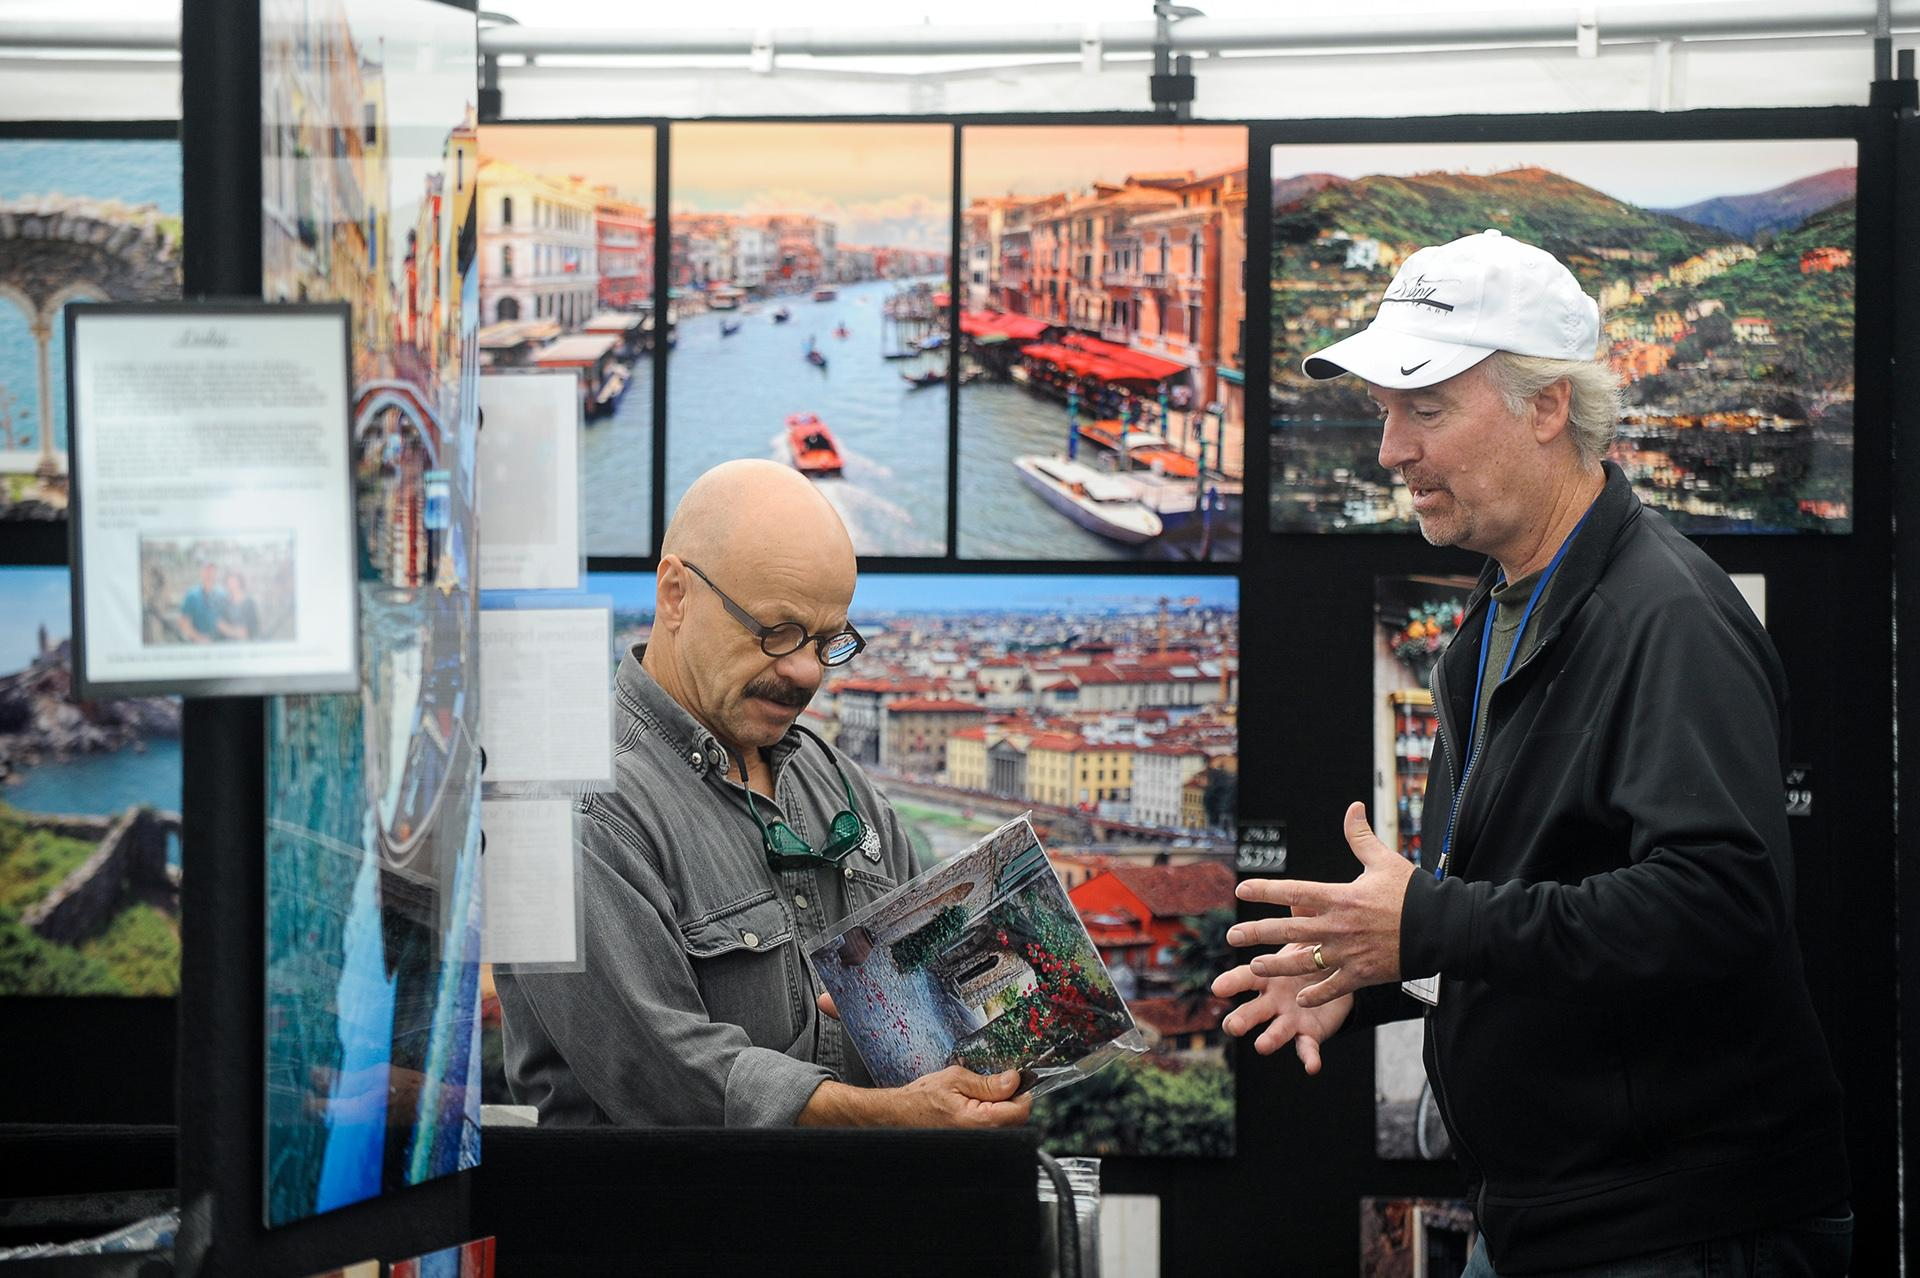 Evanston Art & Big Fork Festival returns August 13-15, 2021 (Courtesy Amdur Productions)